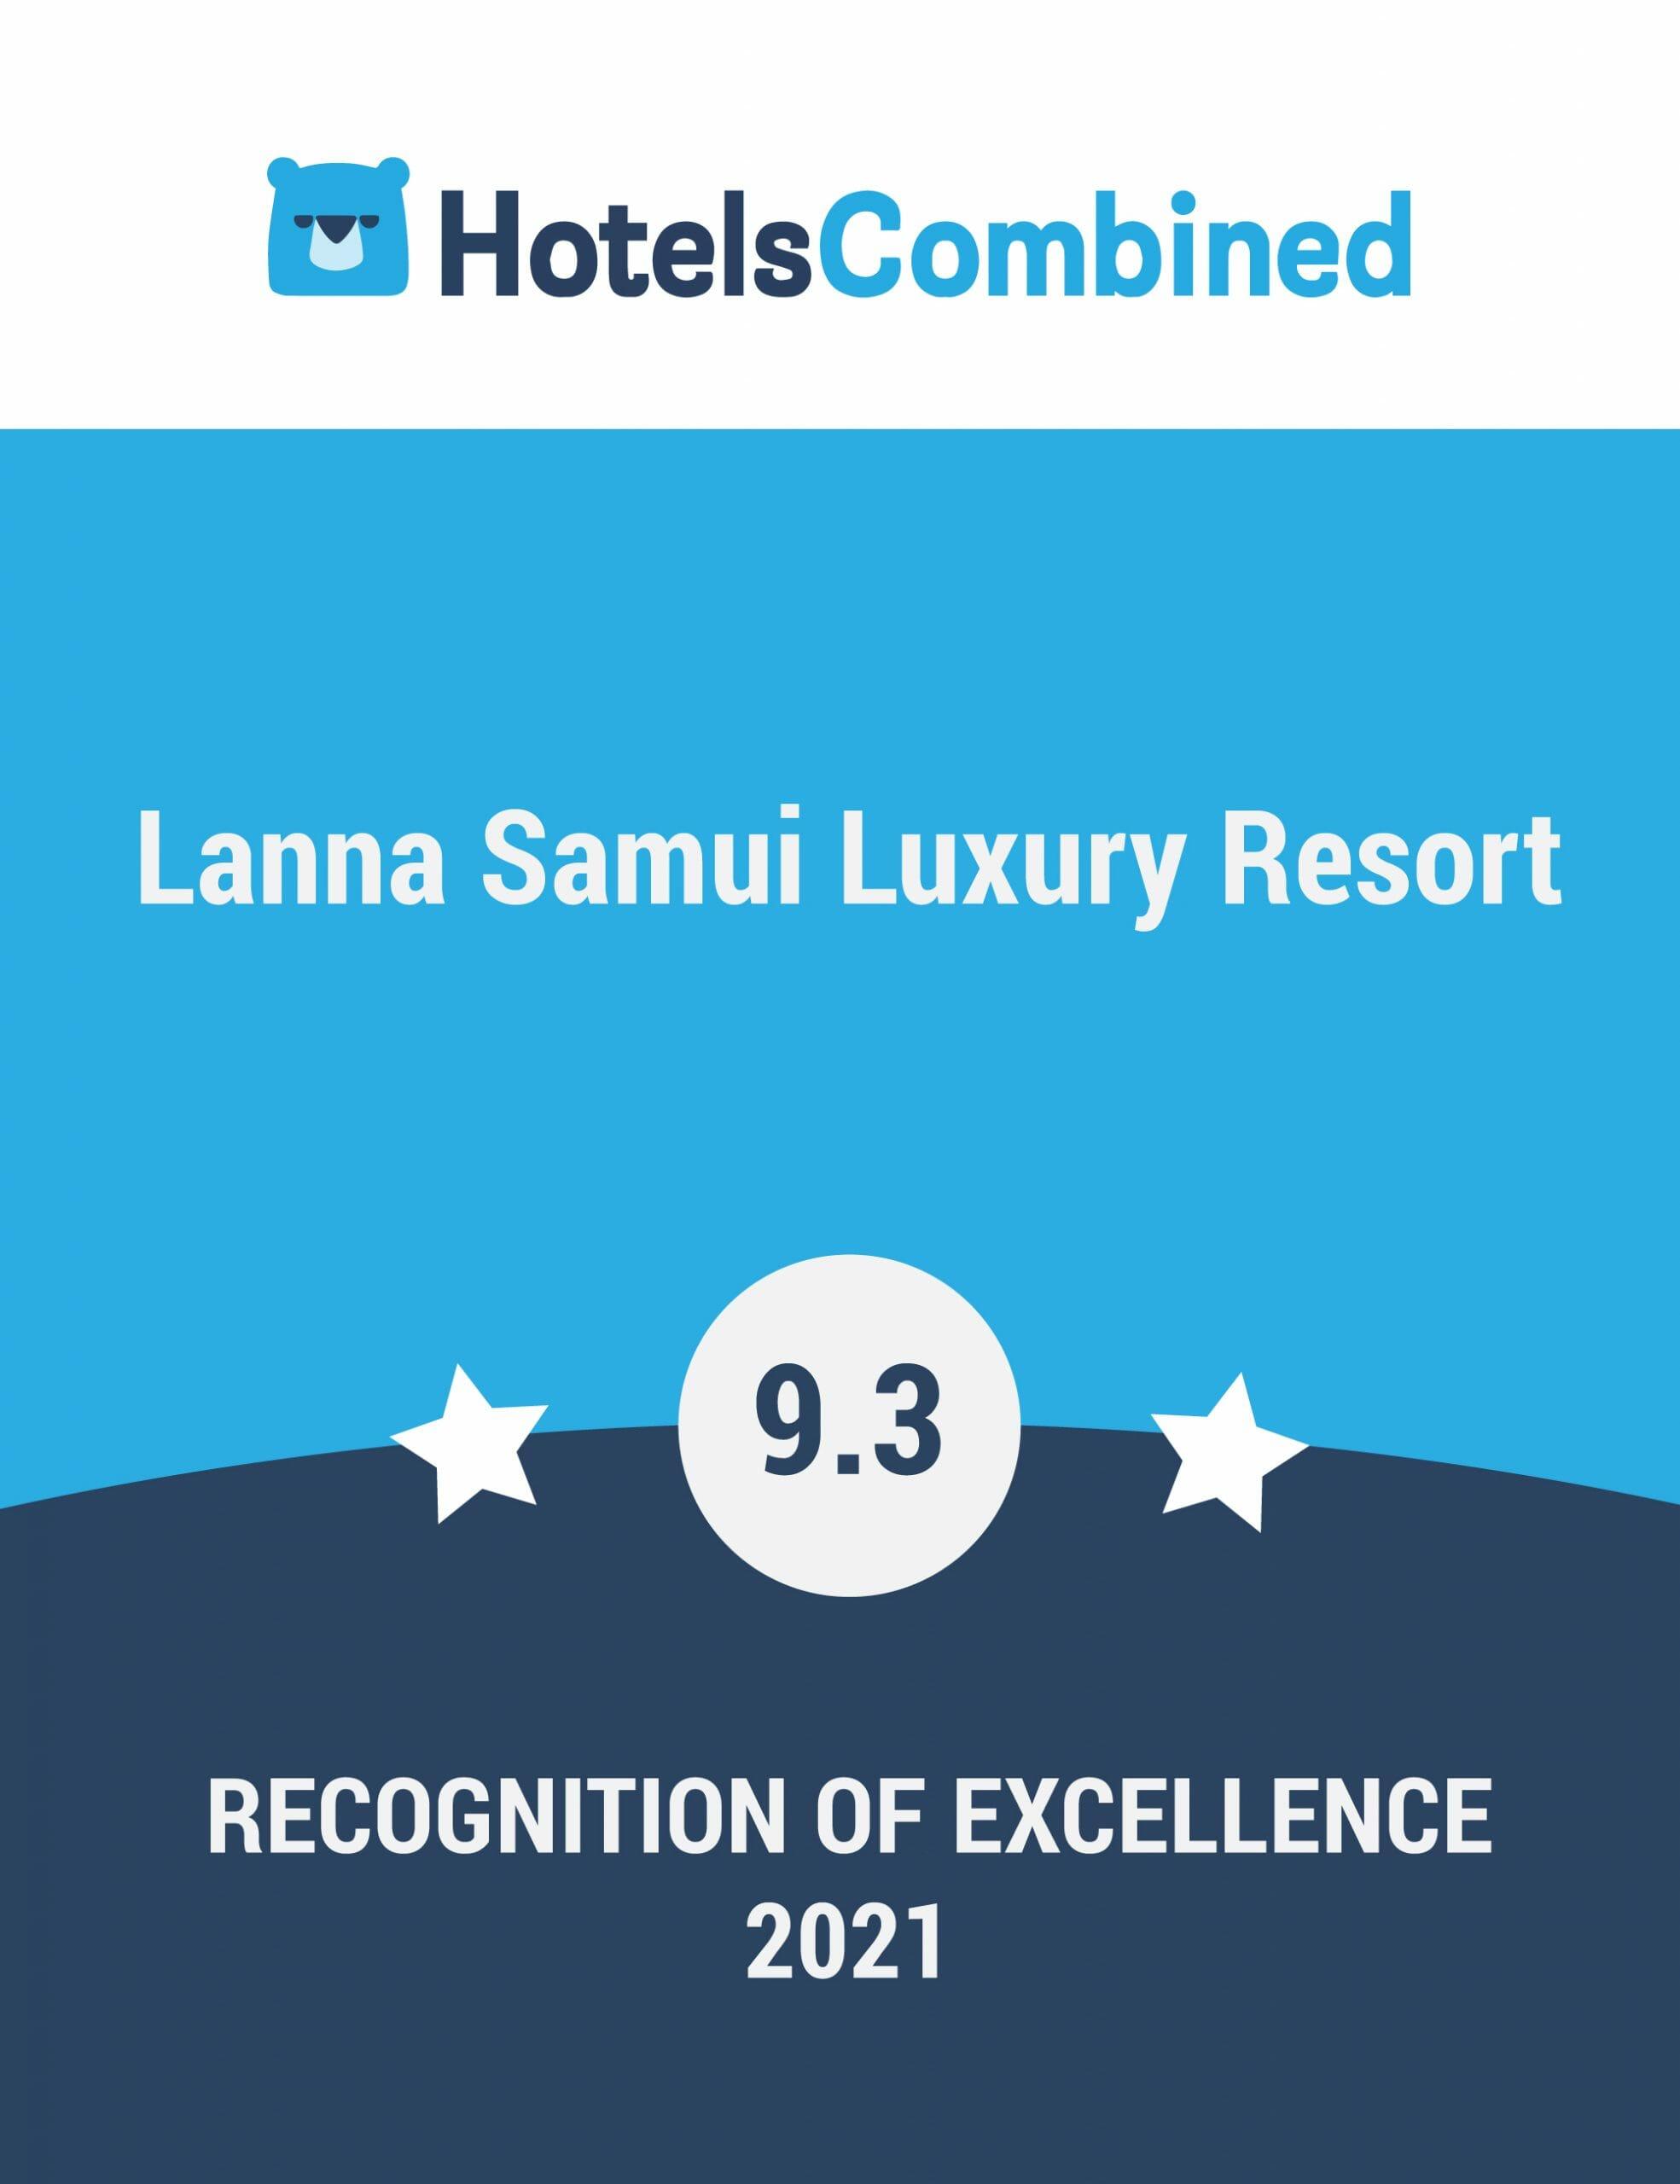 https://lanna-samui.com/wp-content/uploads/2021/08/HotelsCombined-200x260px-scaled.jpg